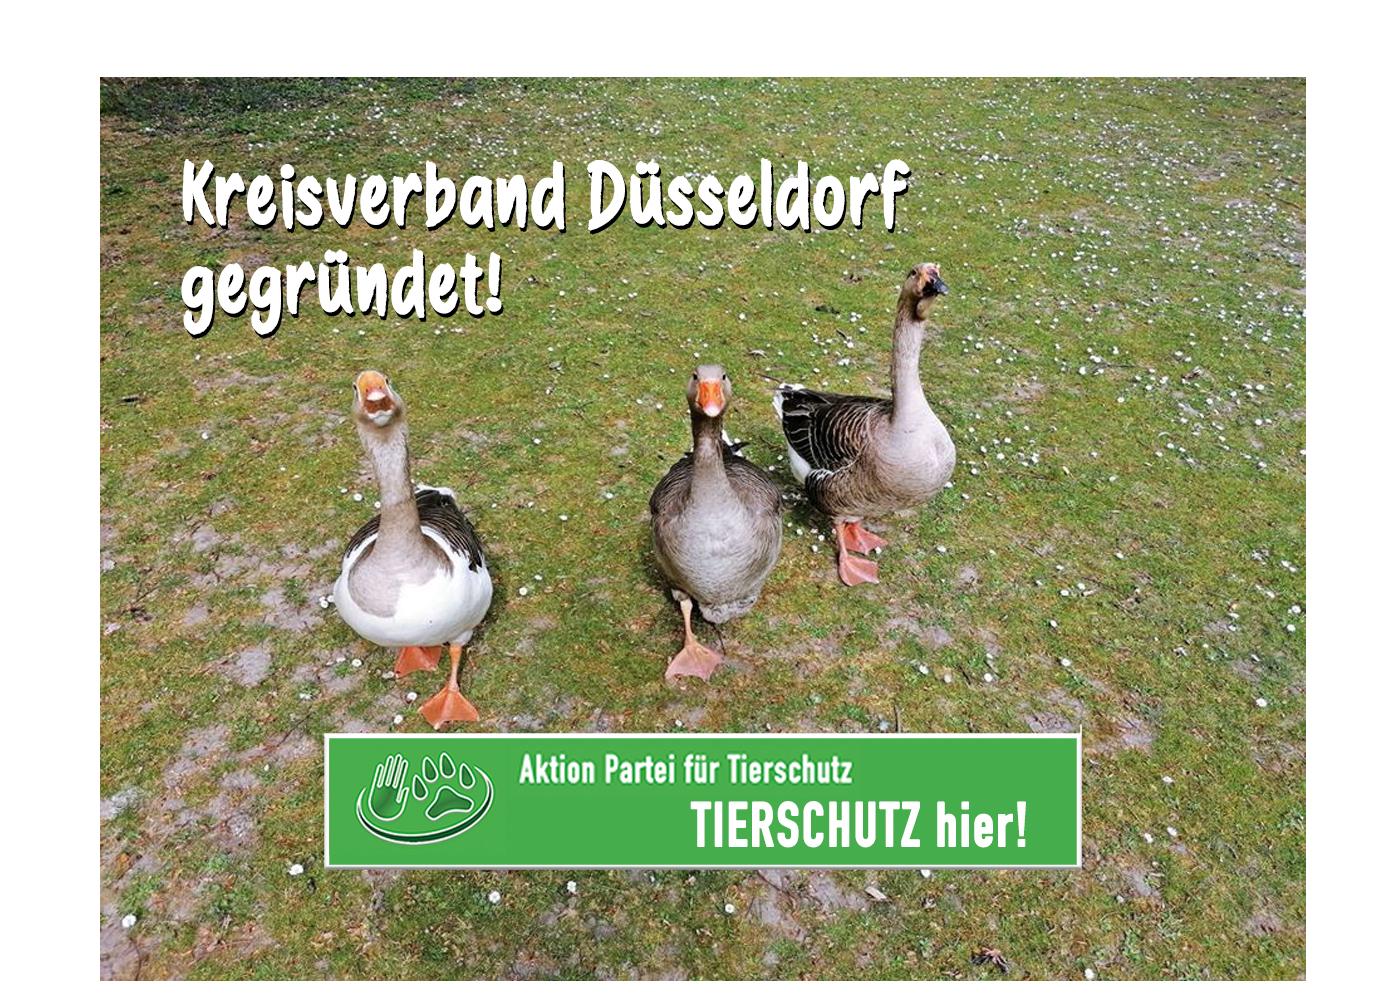 Tierschutz Düsseldorf